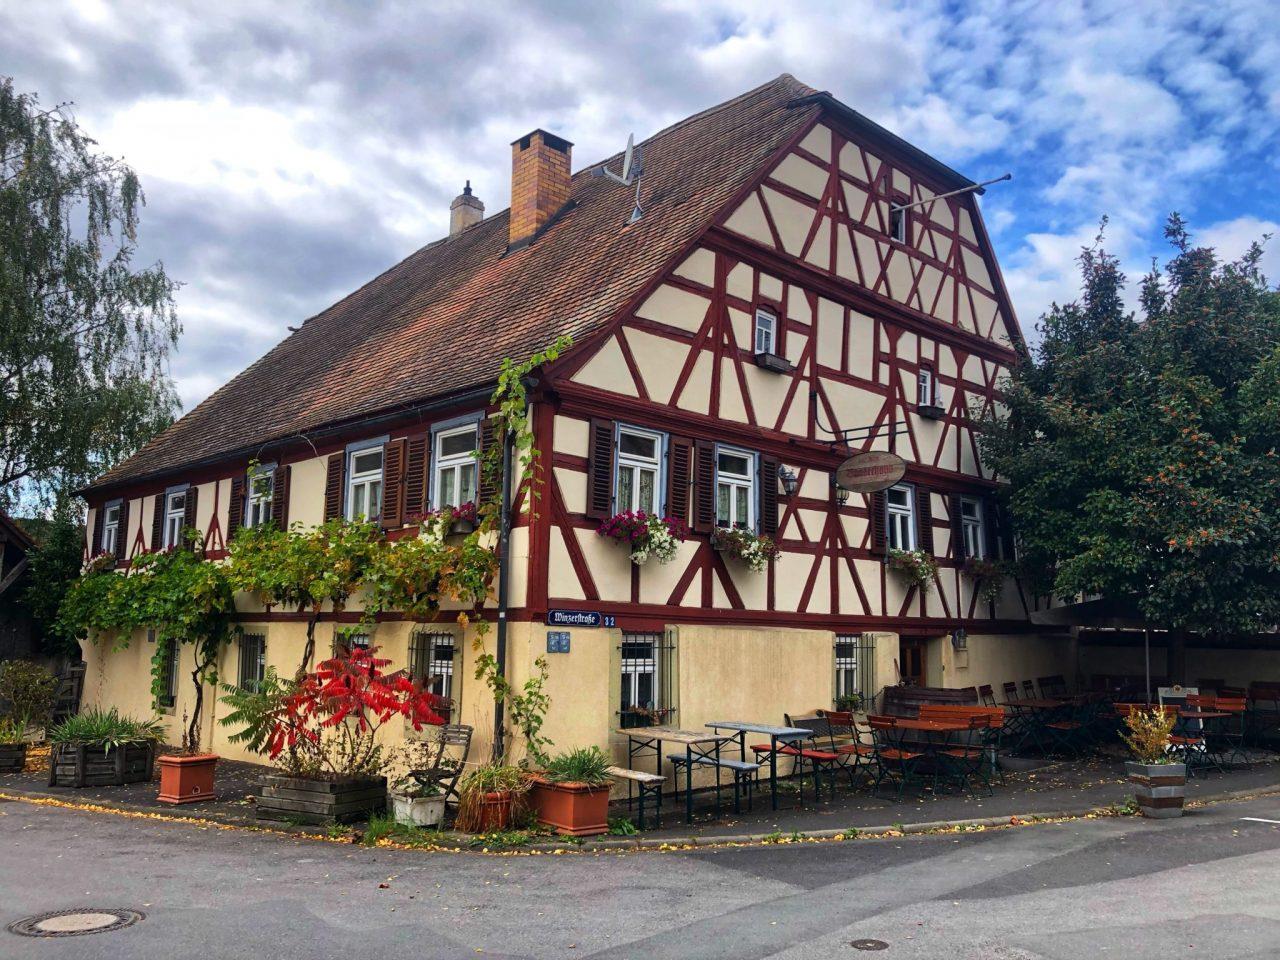 Sommerach, Franconia